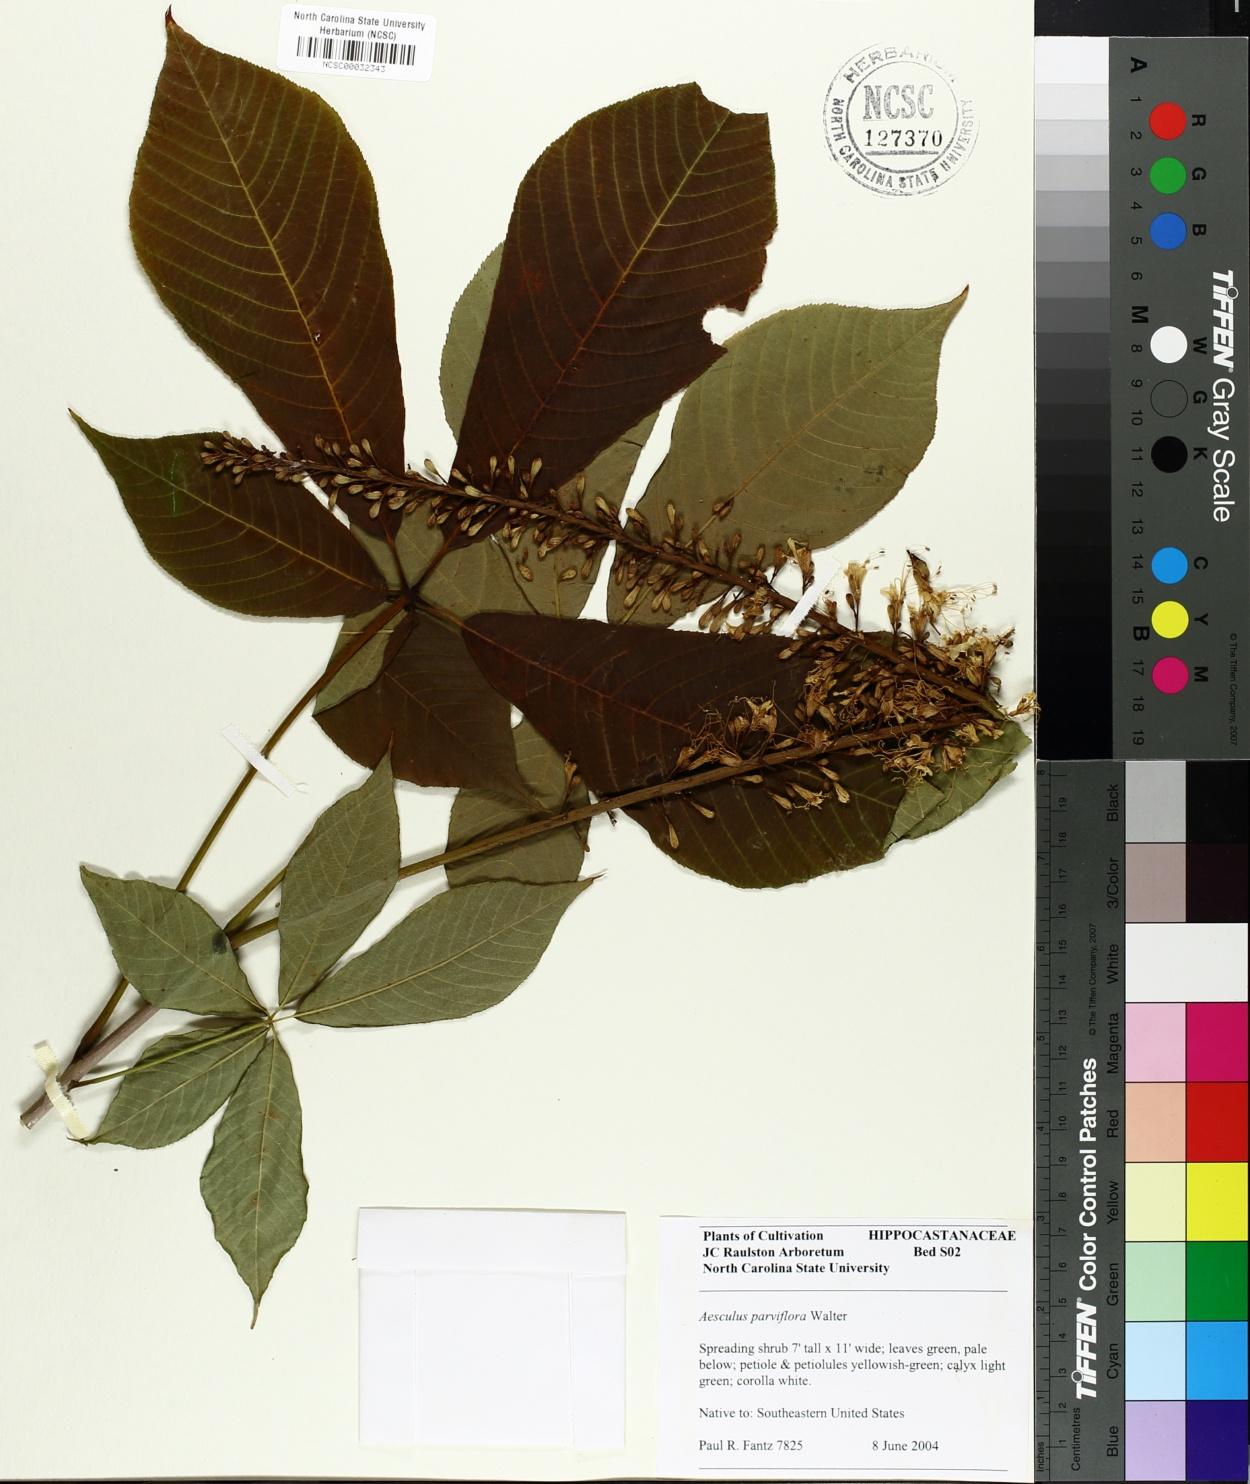 Hippocastanaceae image